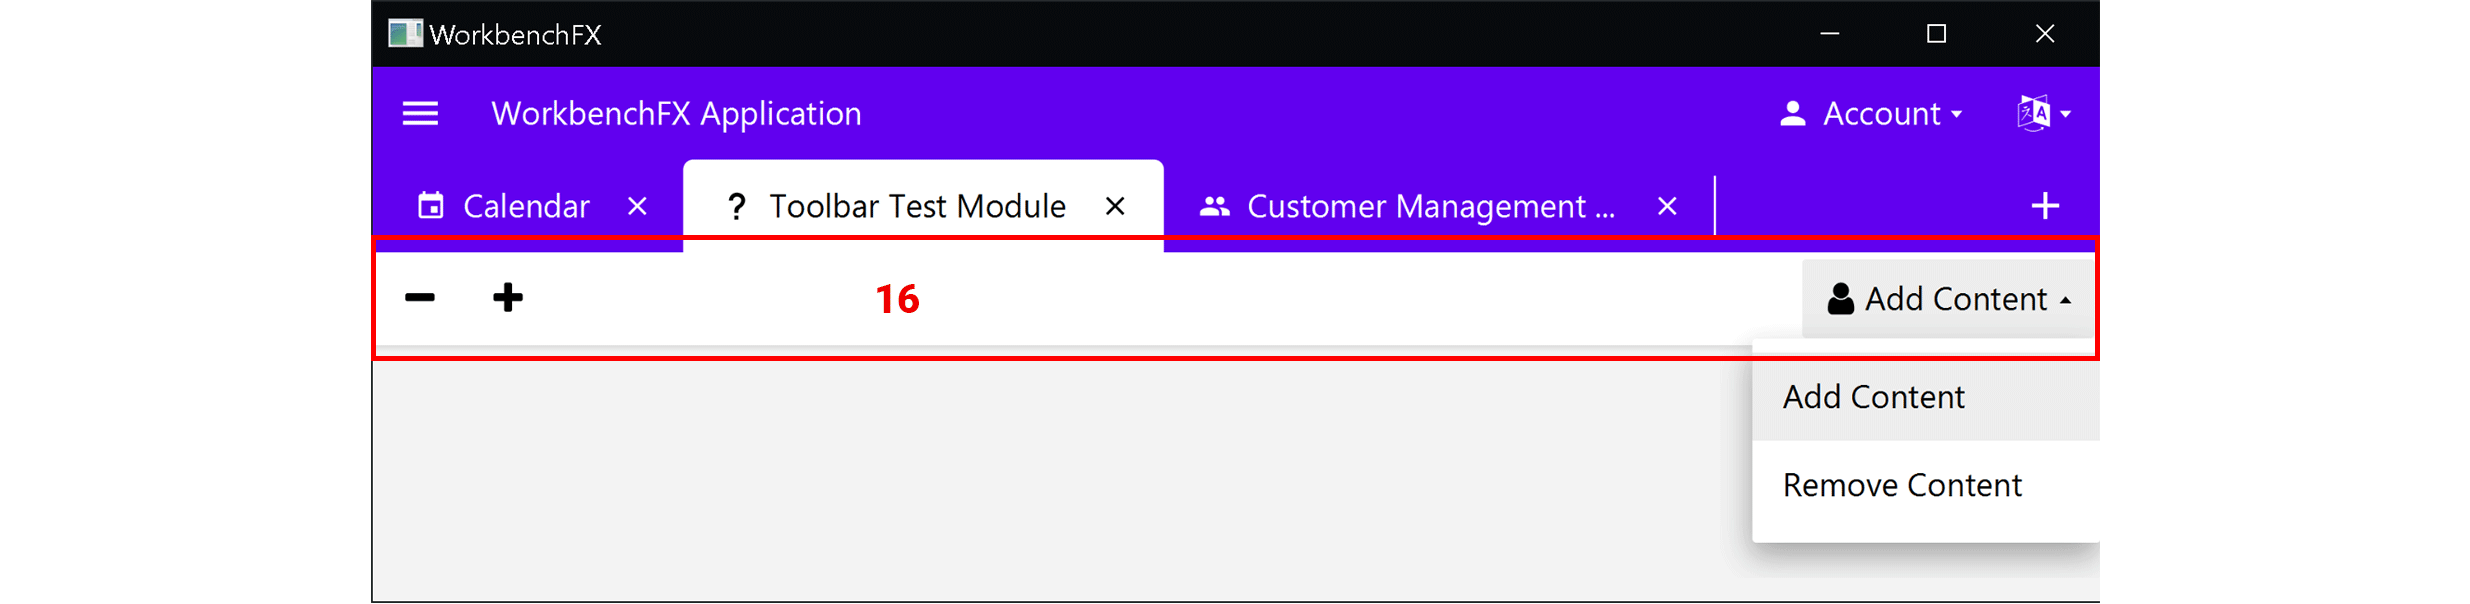 screenshot of the moduleToolbar